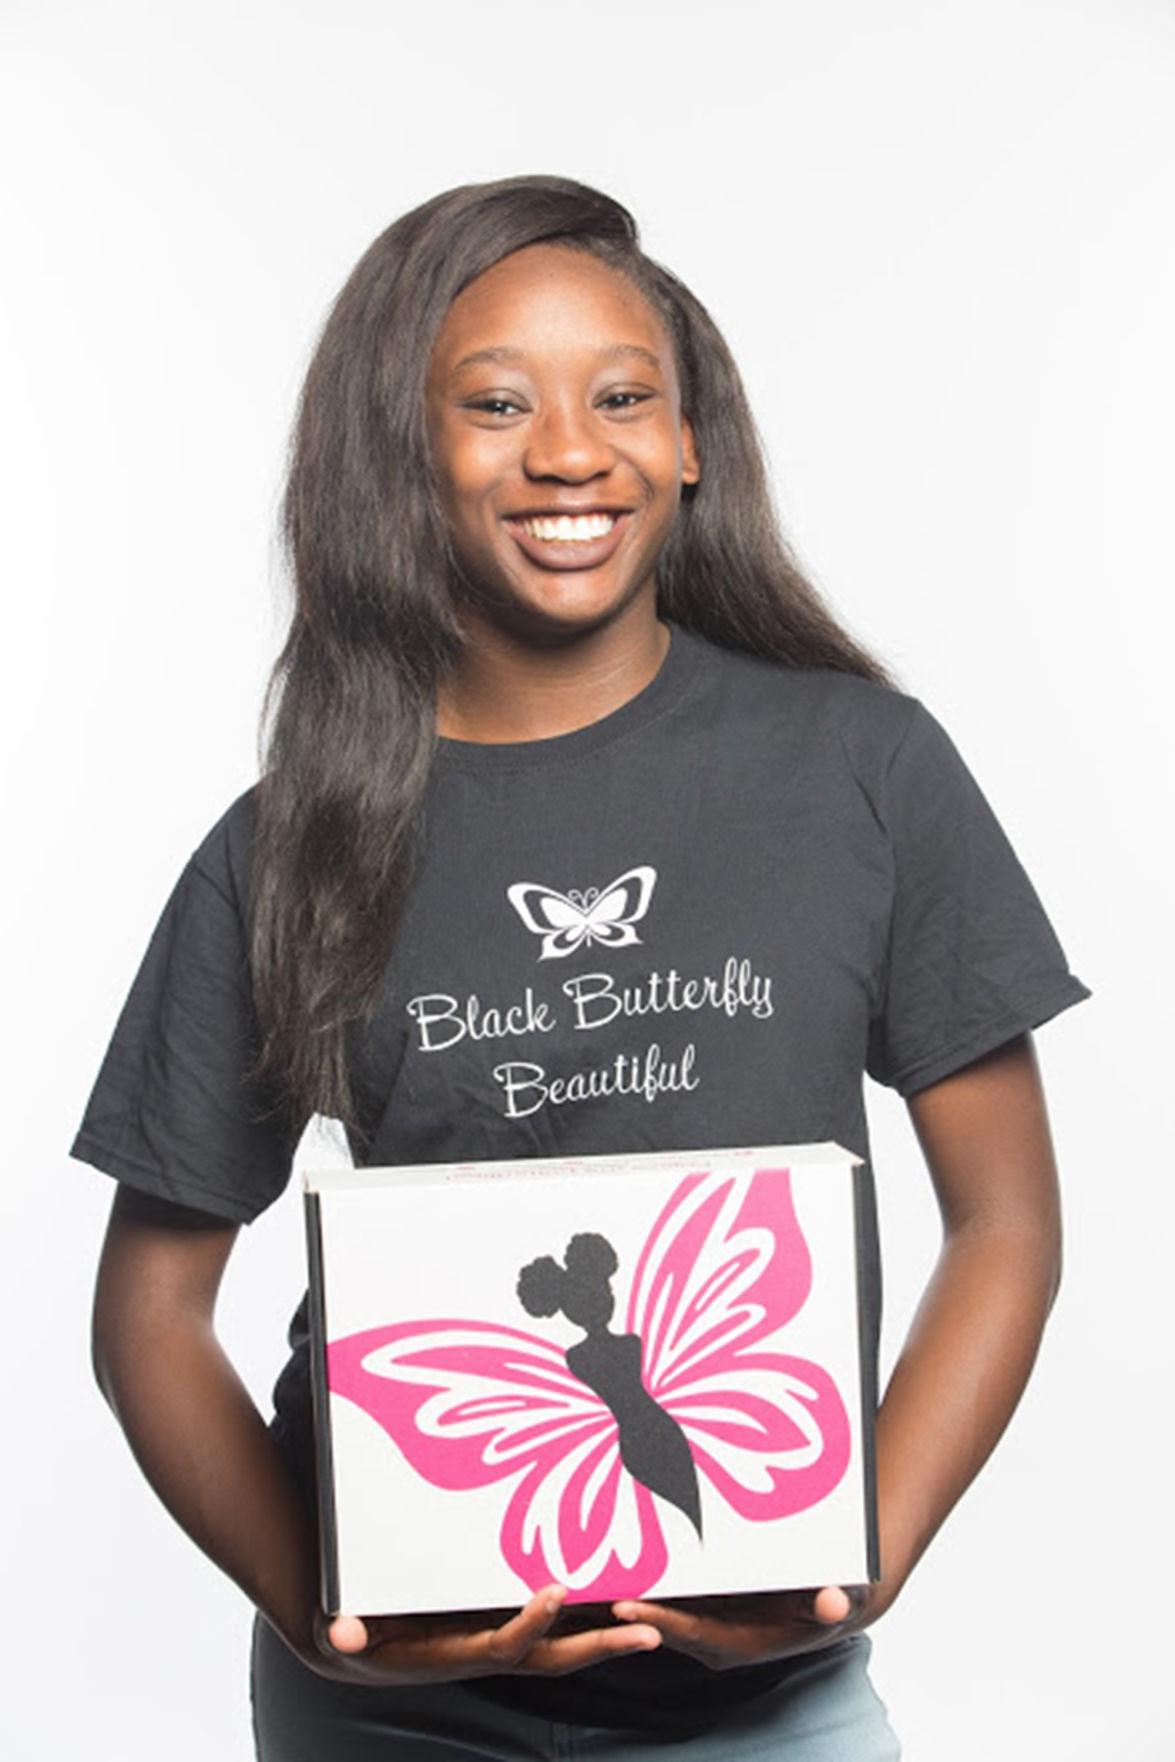 Journi Prewitt, Black Butterfly Beautiful